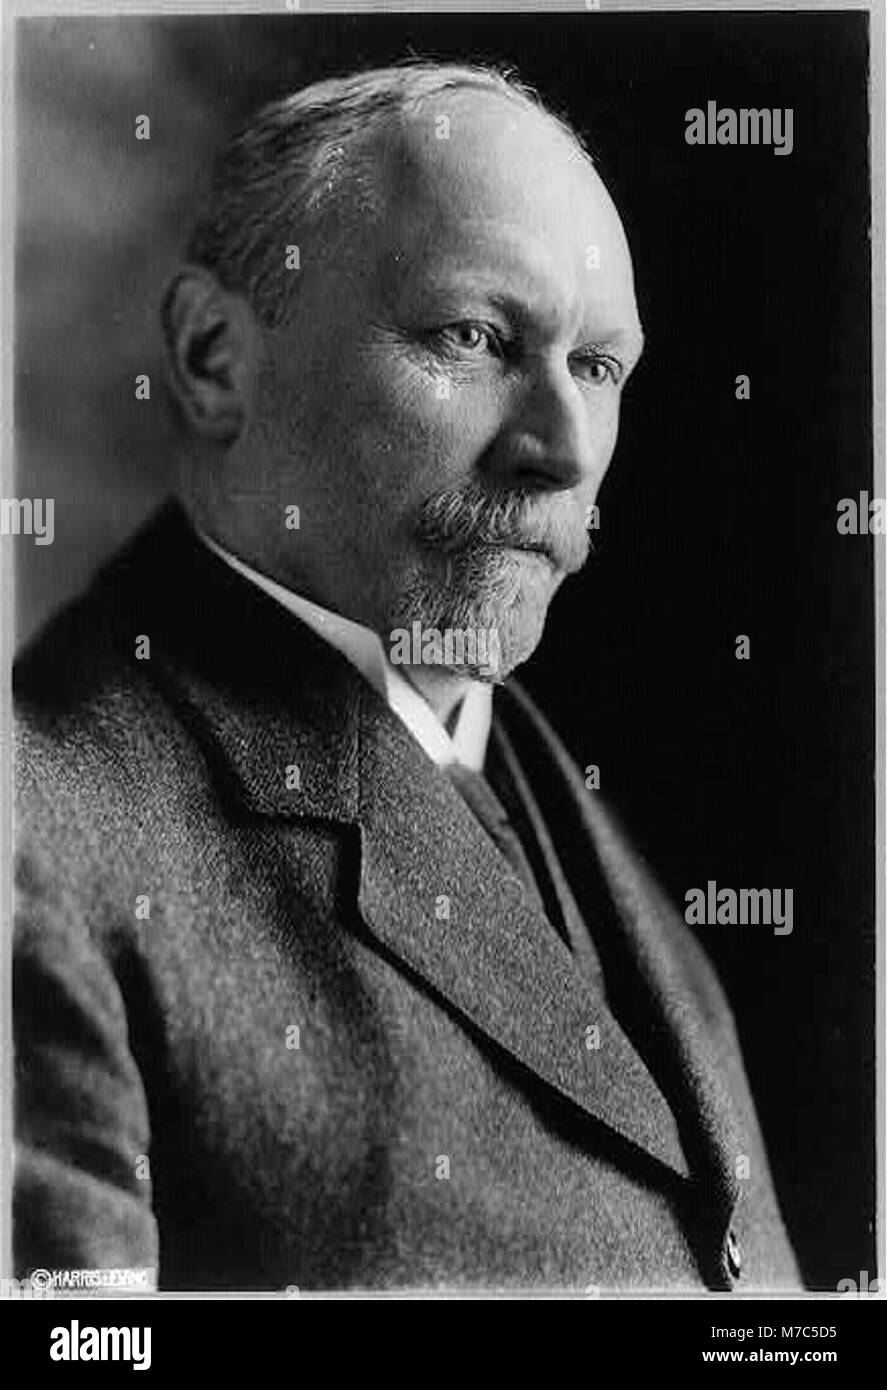 Jan Christian Smuts, 1870-1950 LCCN2002699837 - Stock Image